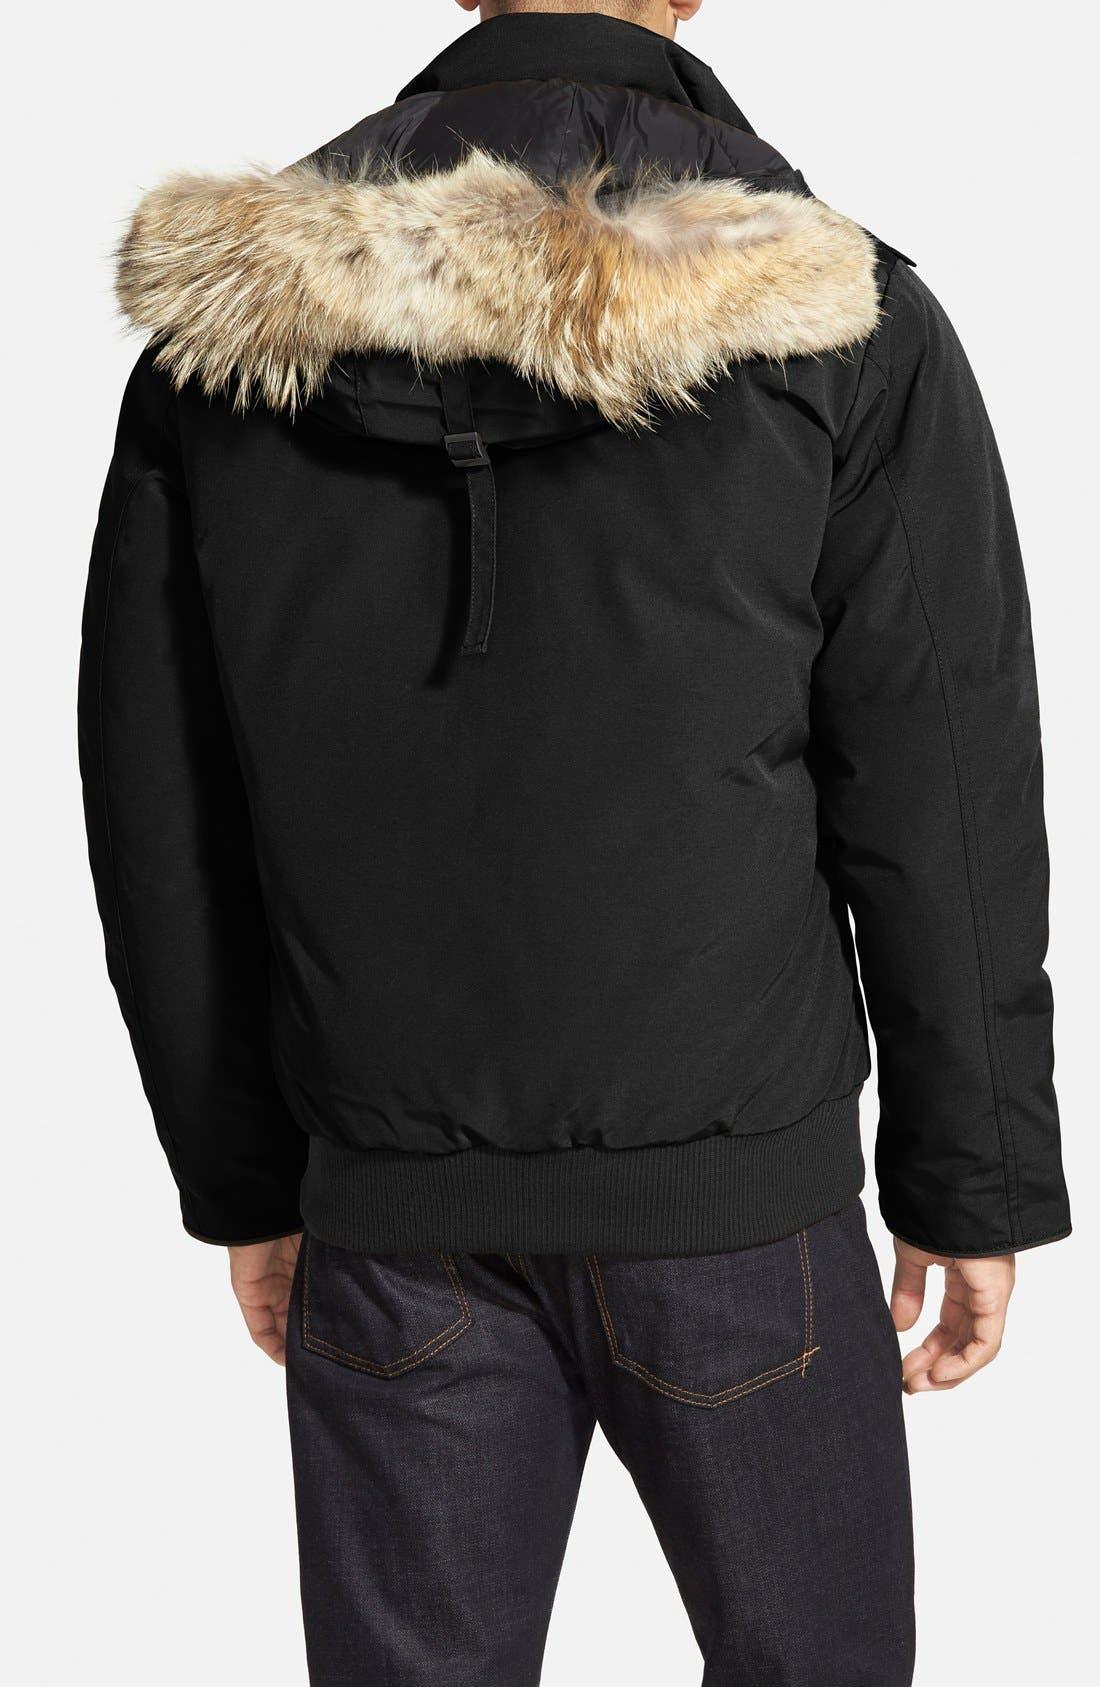 'Borden' Regular Fit Bomber Jacket with Genuine Coyote Trim,                             Alternate thumbnail 2, color,                             Black